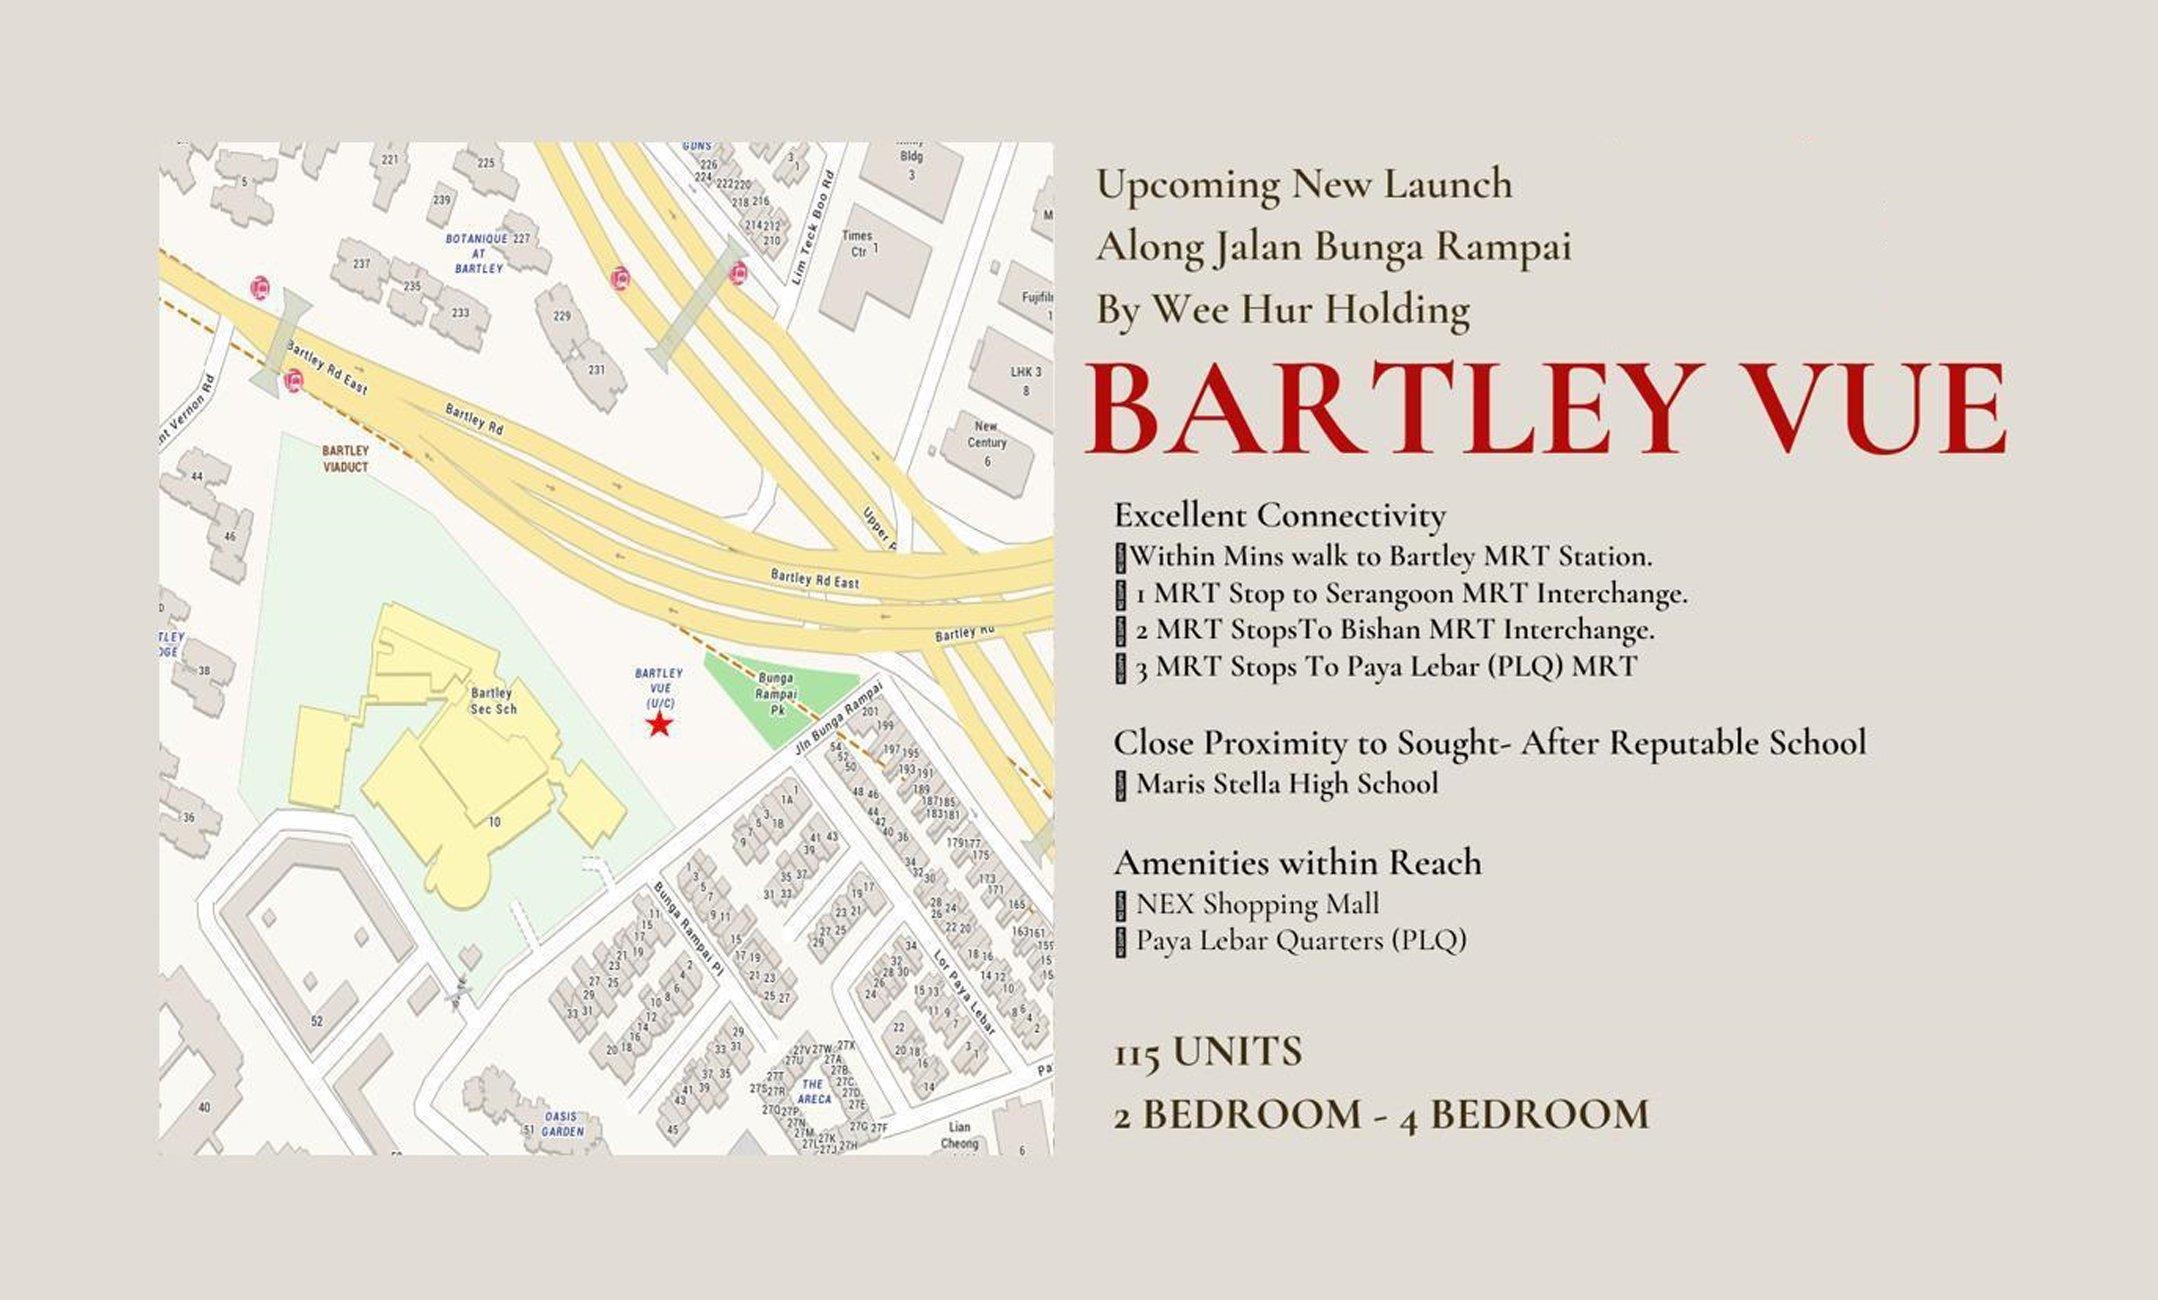 bartley vue launching soon